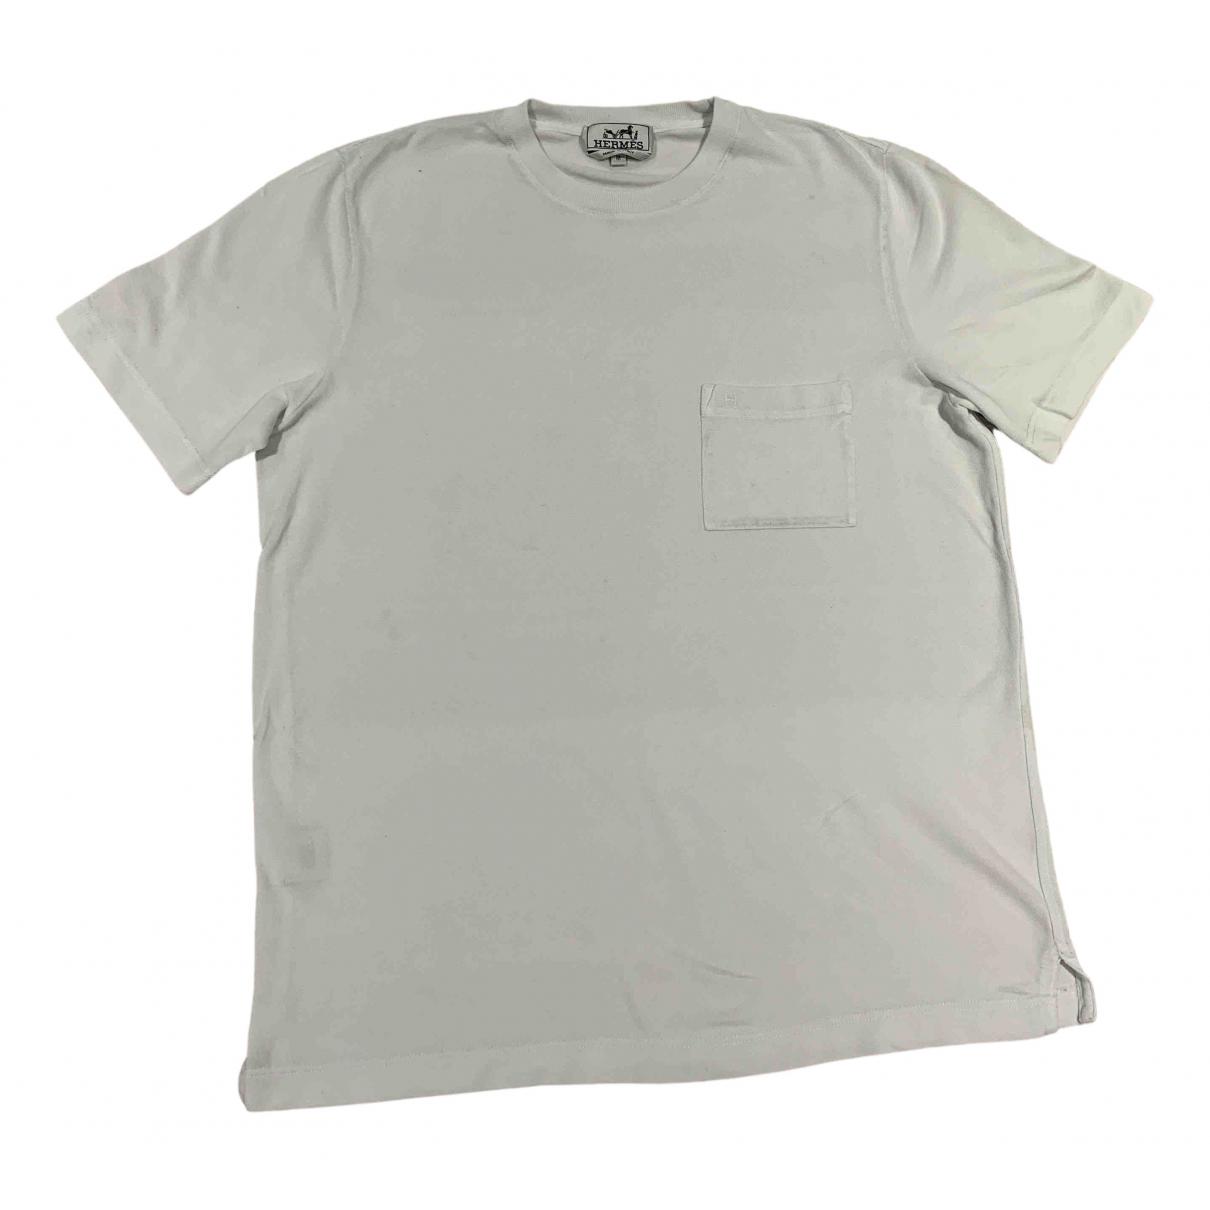 Hermes \N T-Shirts in  Weiss Baumwolle